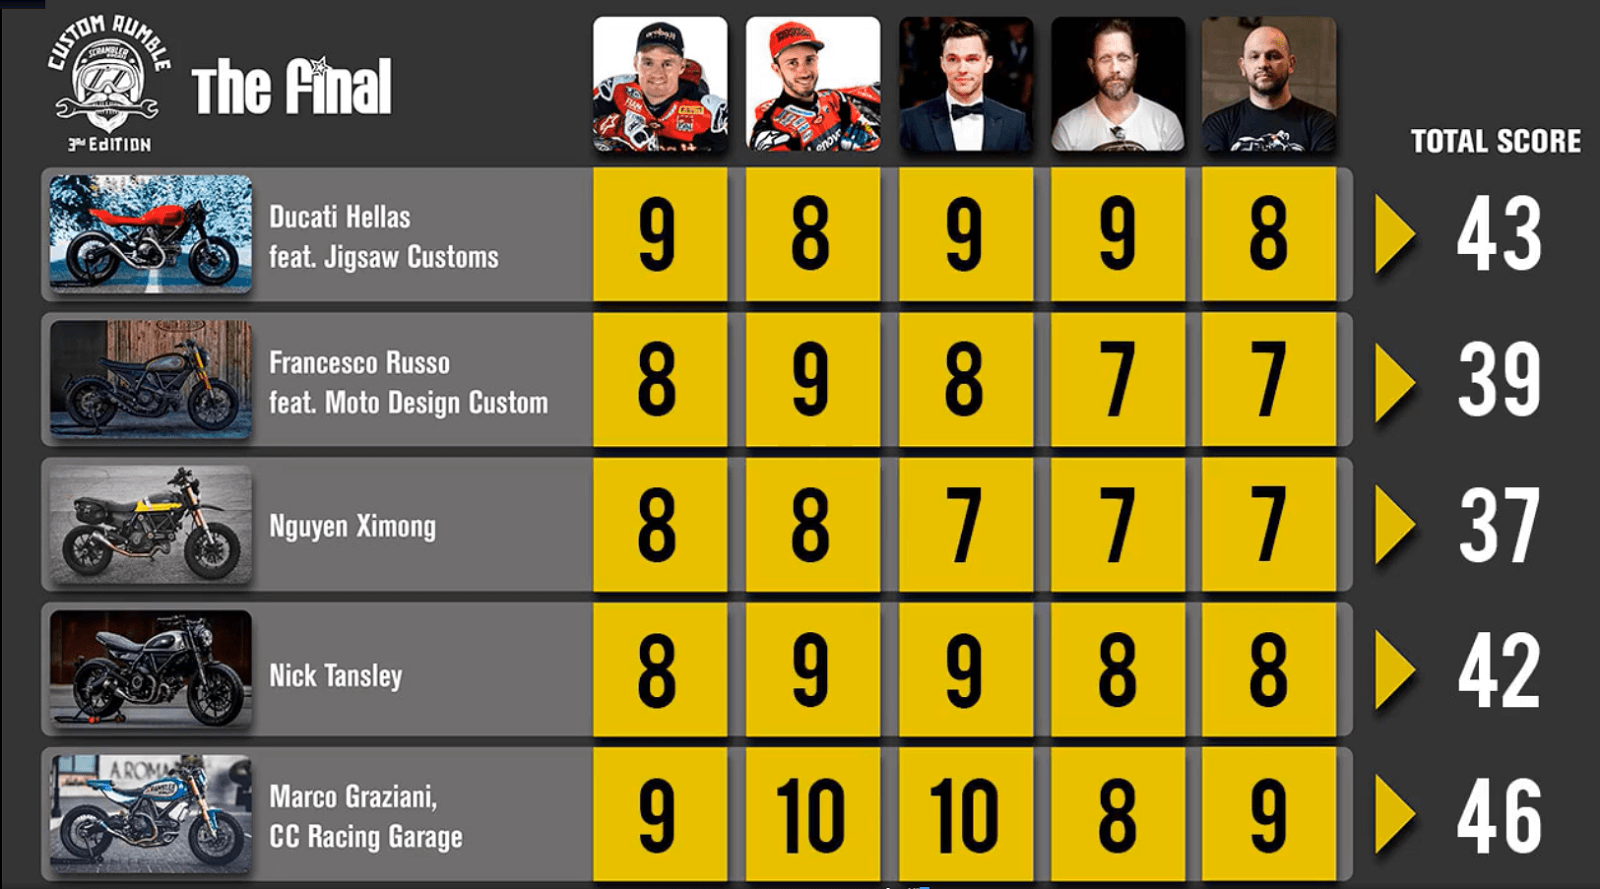 Ducati Custom Rumble διαγωνισμός - Πίνακας βαθμολογίας